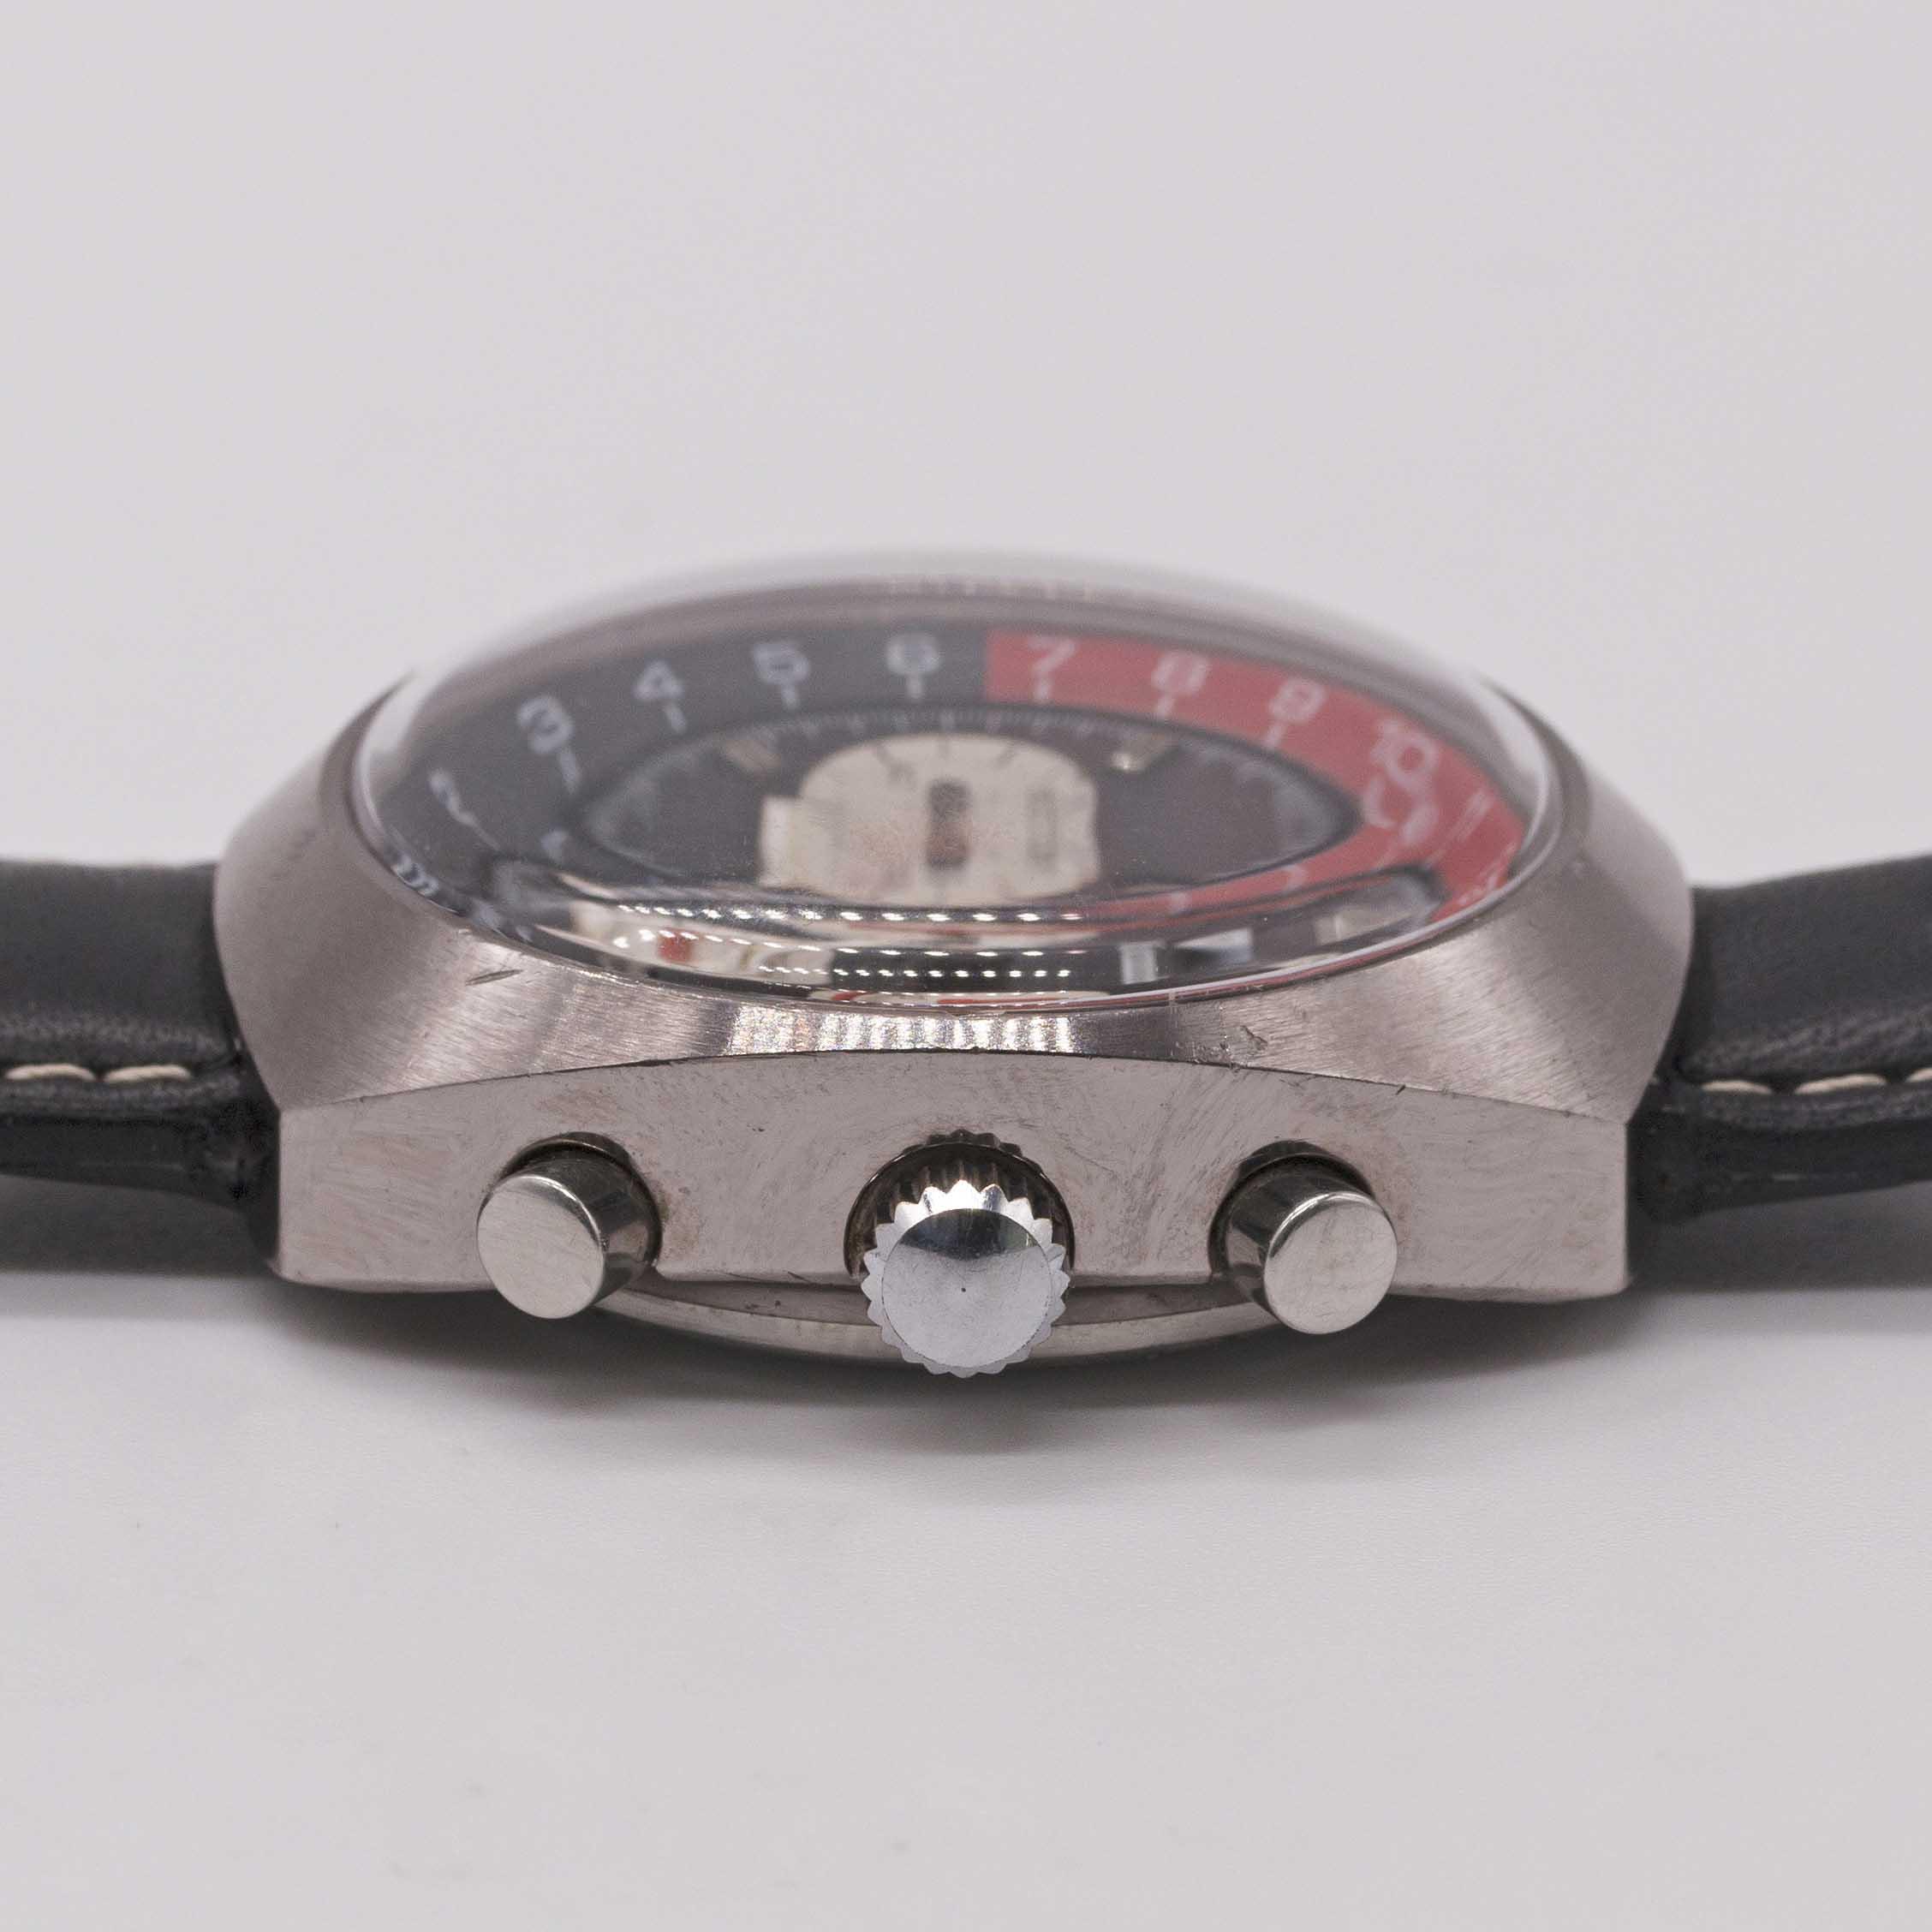 "Lot 2 - A GENTLEMAN'S NIVADA GMT ""COKE"" CHRONOGRAPH WRIST WATCH CIRCA 1970, REF. 5750 Movement:17J,"